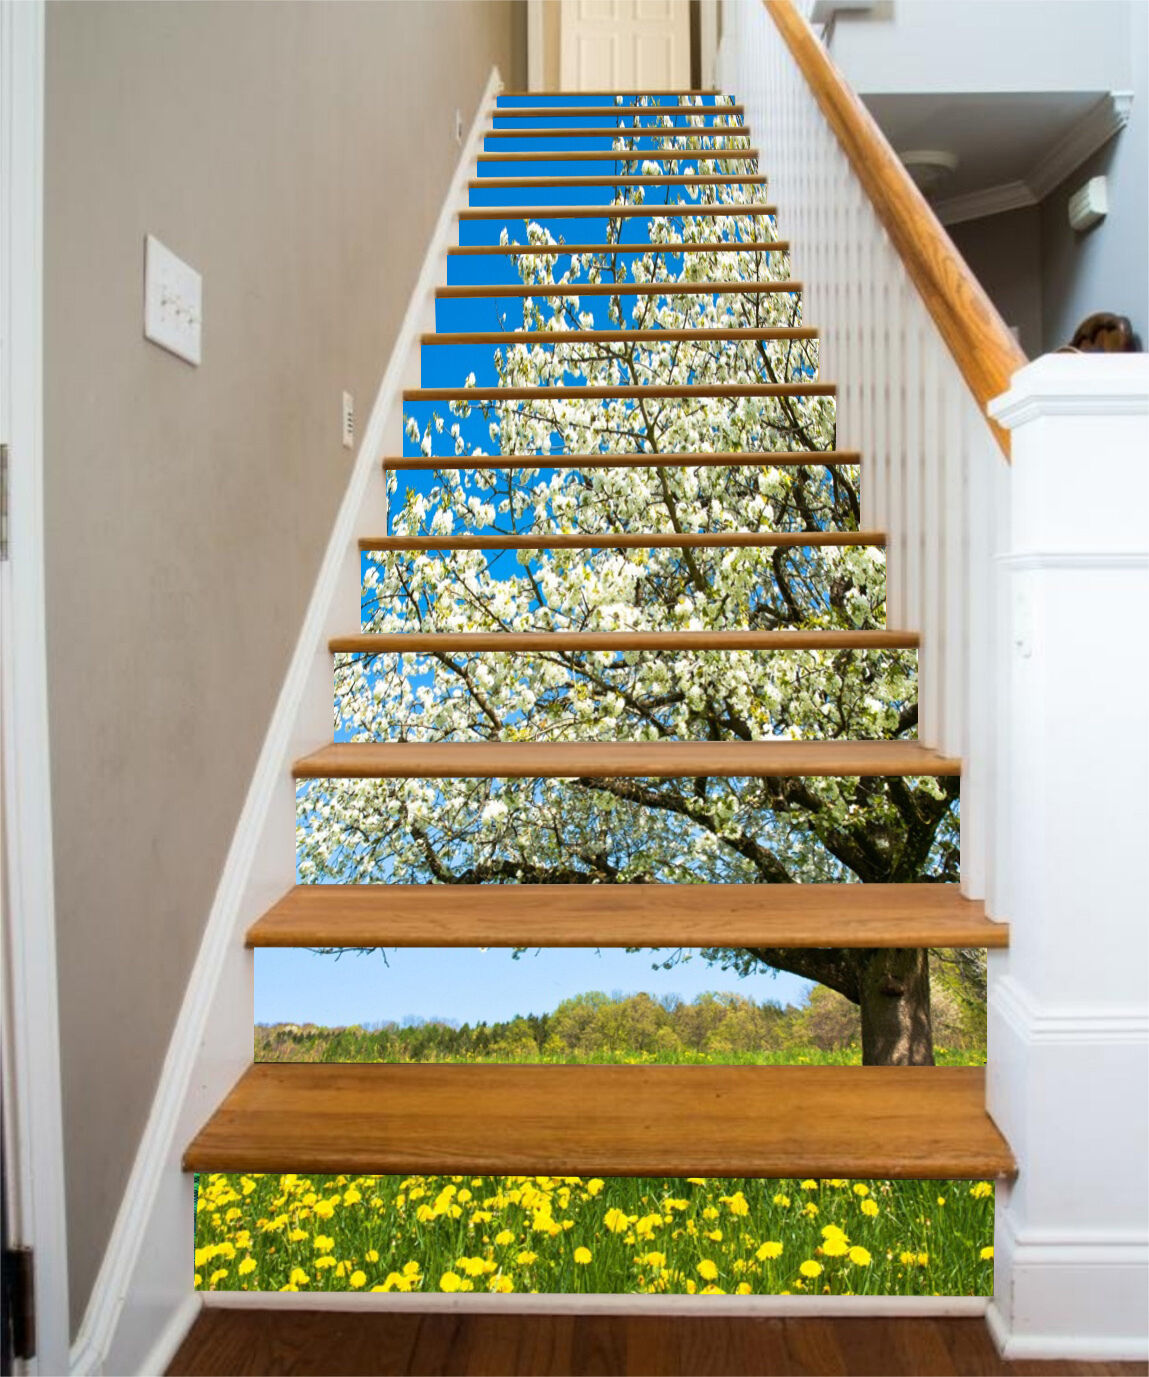 3D Tree Flowers 27 Stair Risers Decoration Photo Mural Vinyl Decal Wallpaper UK